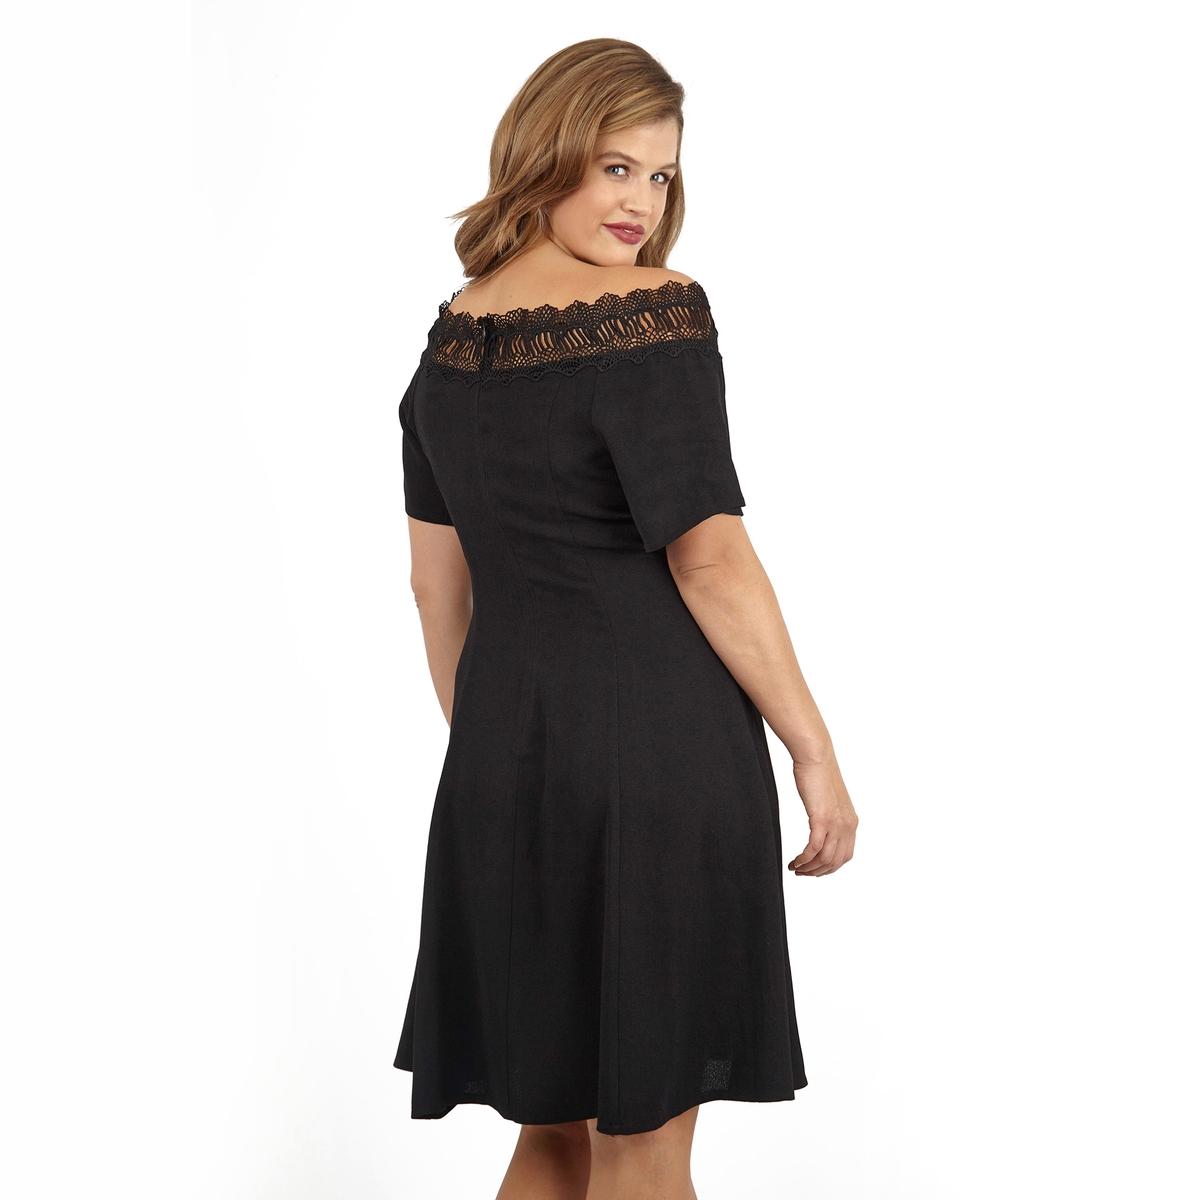 ПлатьеПлатье LOVEDROBE. 100% полиэстер.<br><br>Цвет: черный<br>Размер: 44 (FR) - 50 (RUS).54/56 (FR) - 60/62 (RUS).50/52 (FR) - 56/58 (RUS)